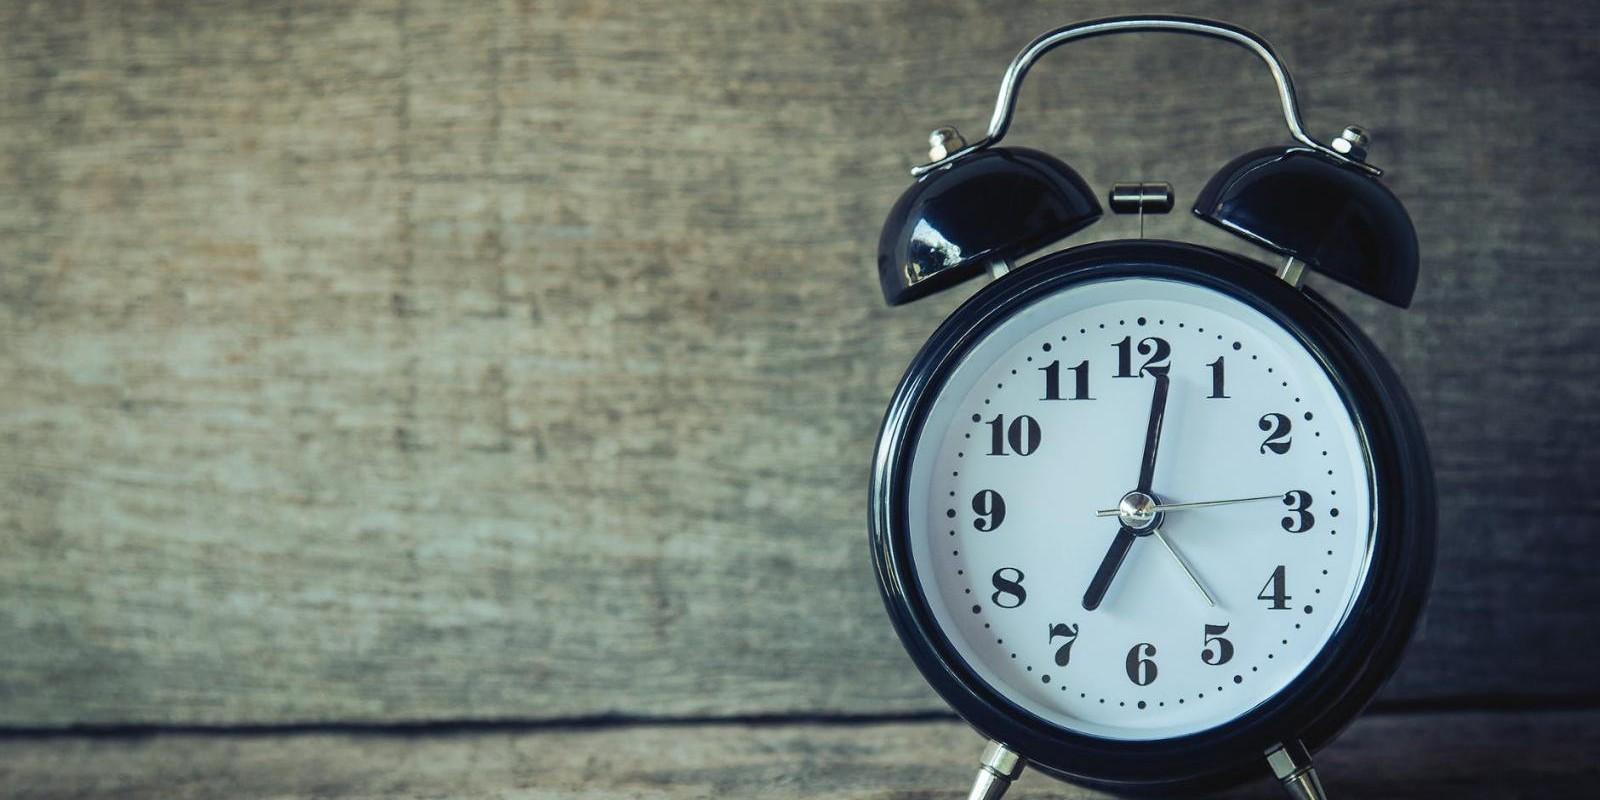 7 dicas para estar sempre dentro do prazo de entrega